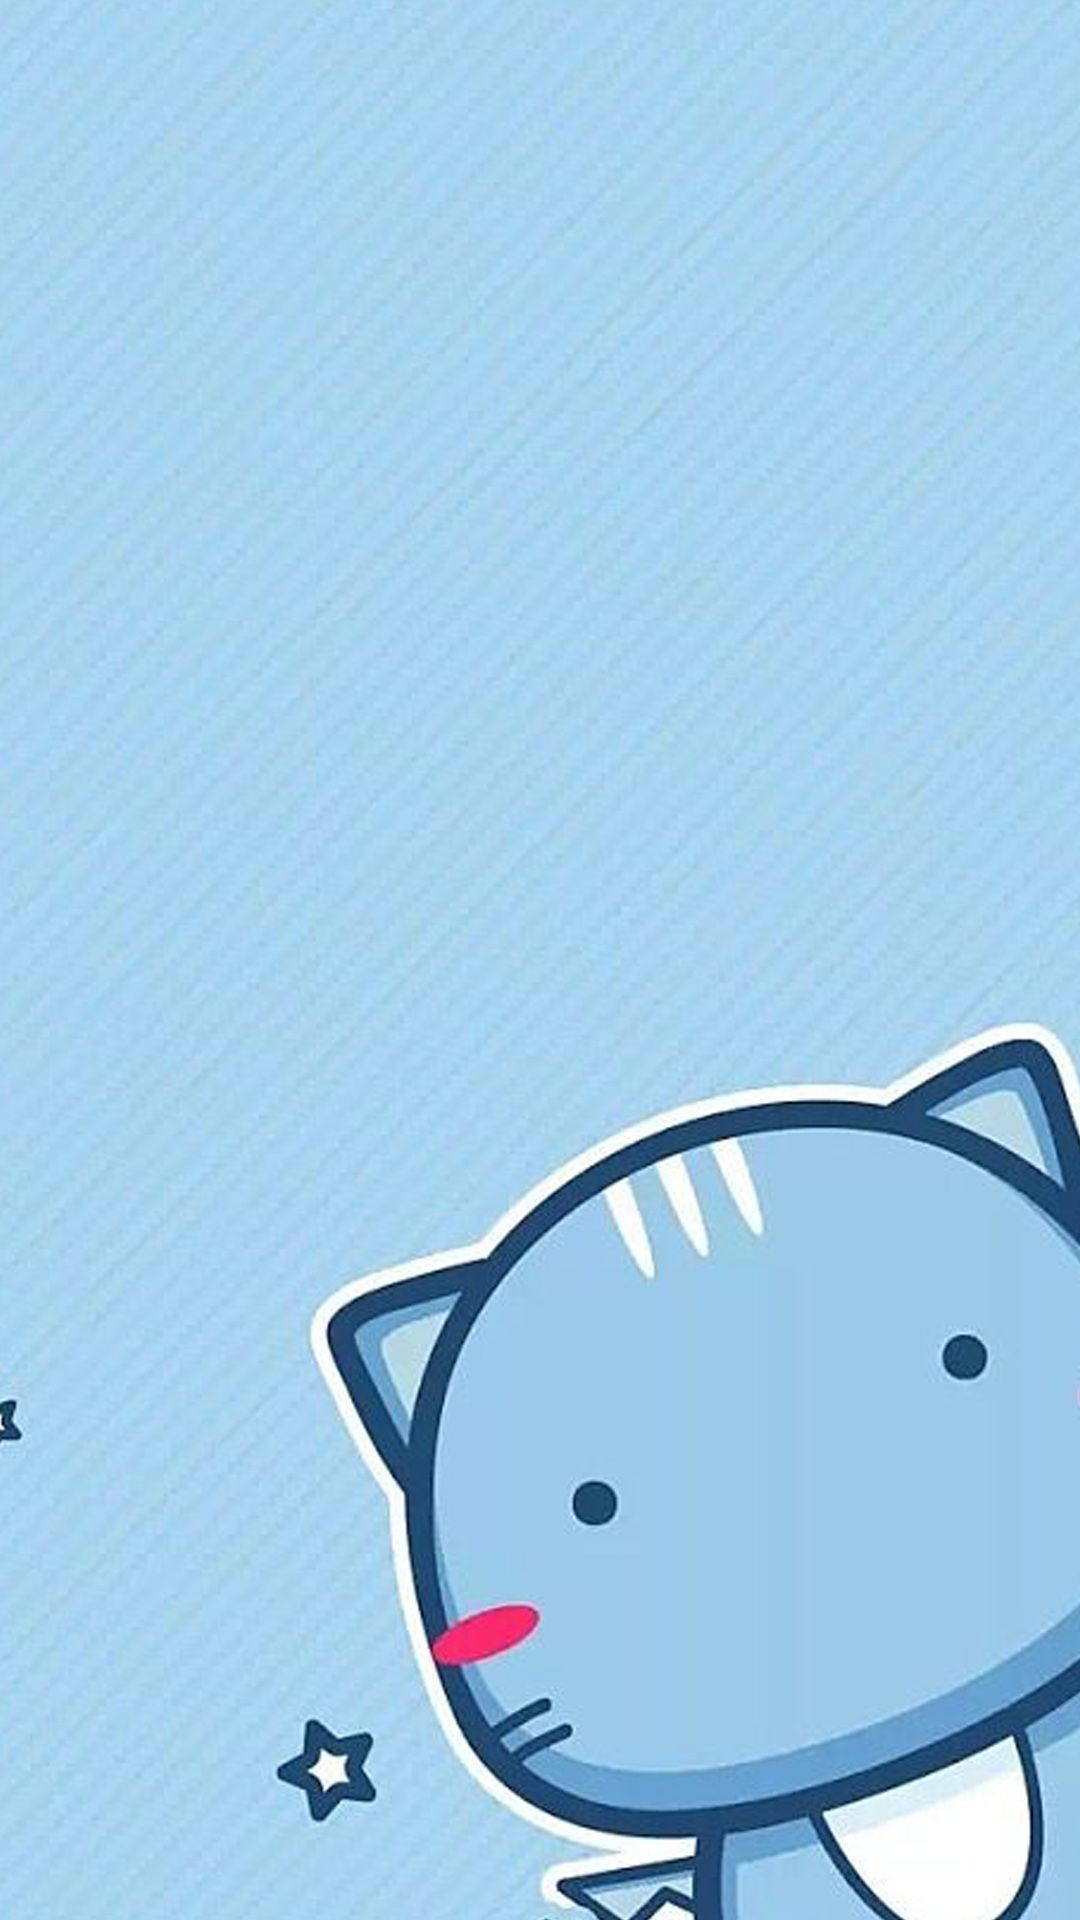 Cute Cartoon Wallpapers Top Free Cute Cartoon Backgrounds